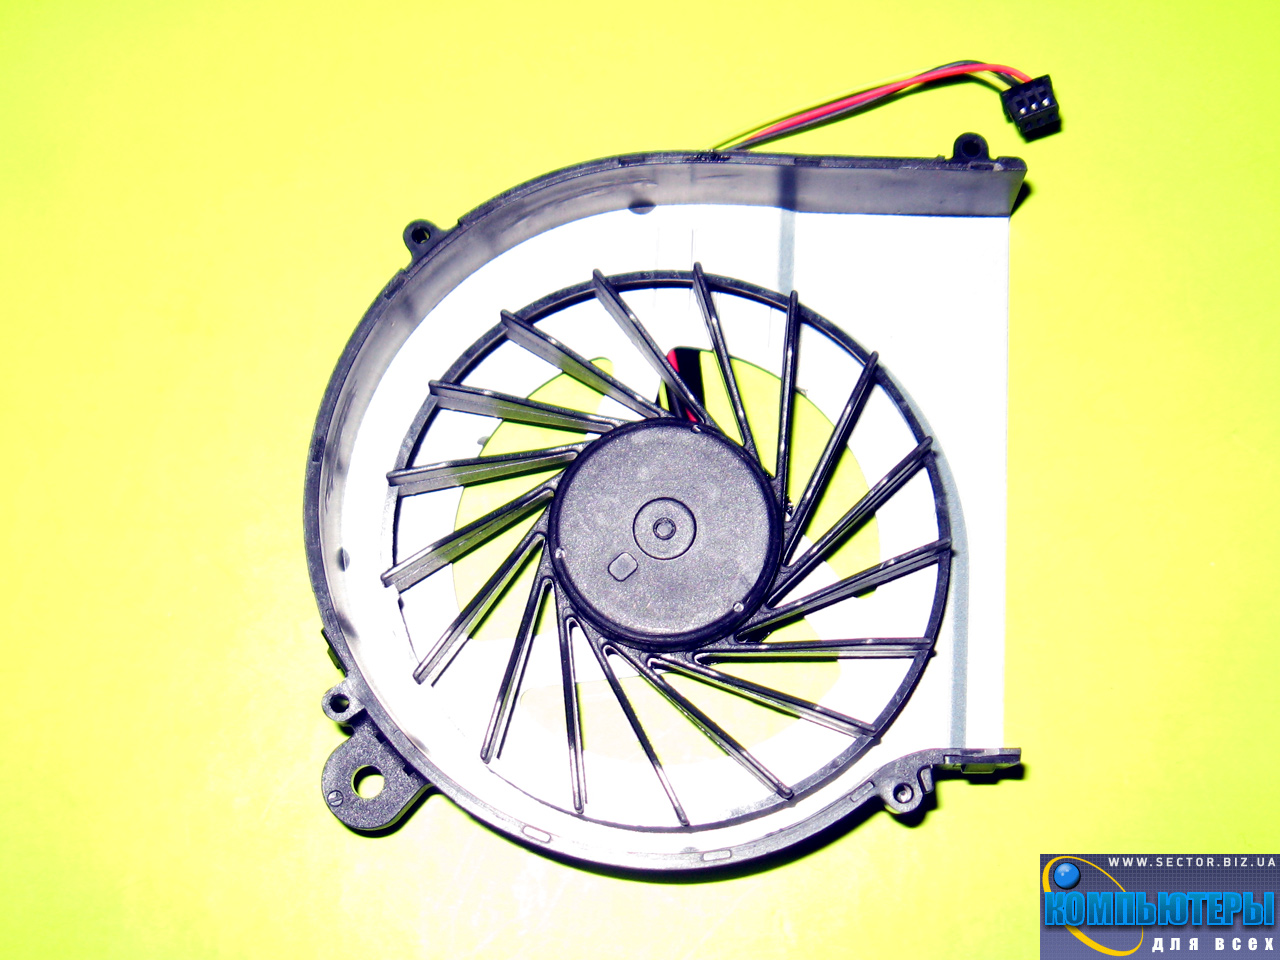 Кулер к ноутбуку HP Compaq CQ42 G42 G4 G6 G7 CQ56 G56 p/n: DFS531105MC0T FAB9. Фото № 1.